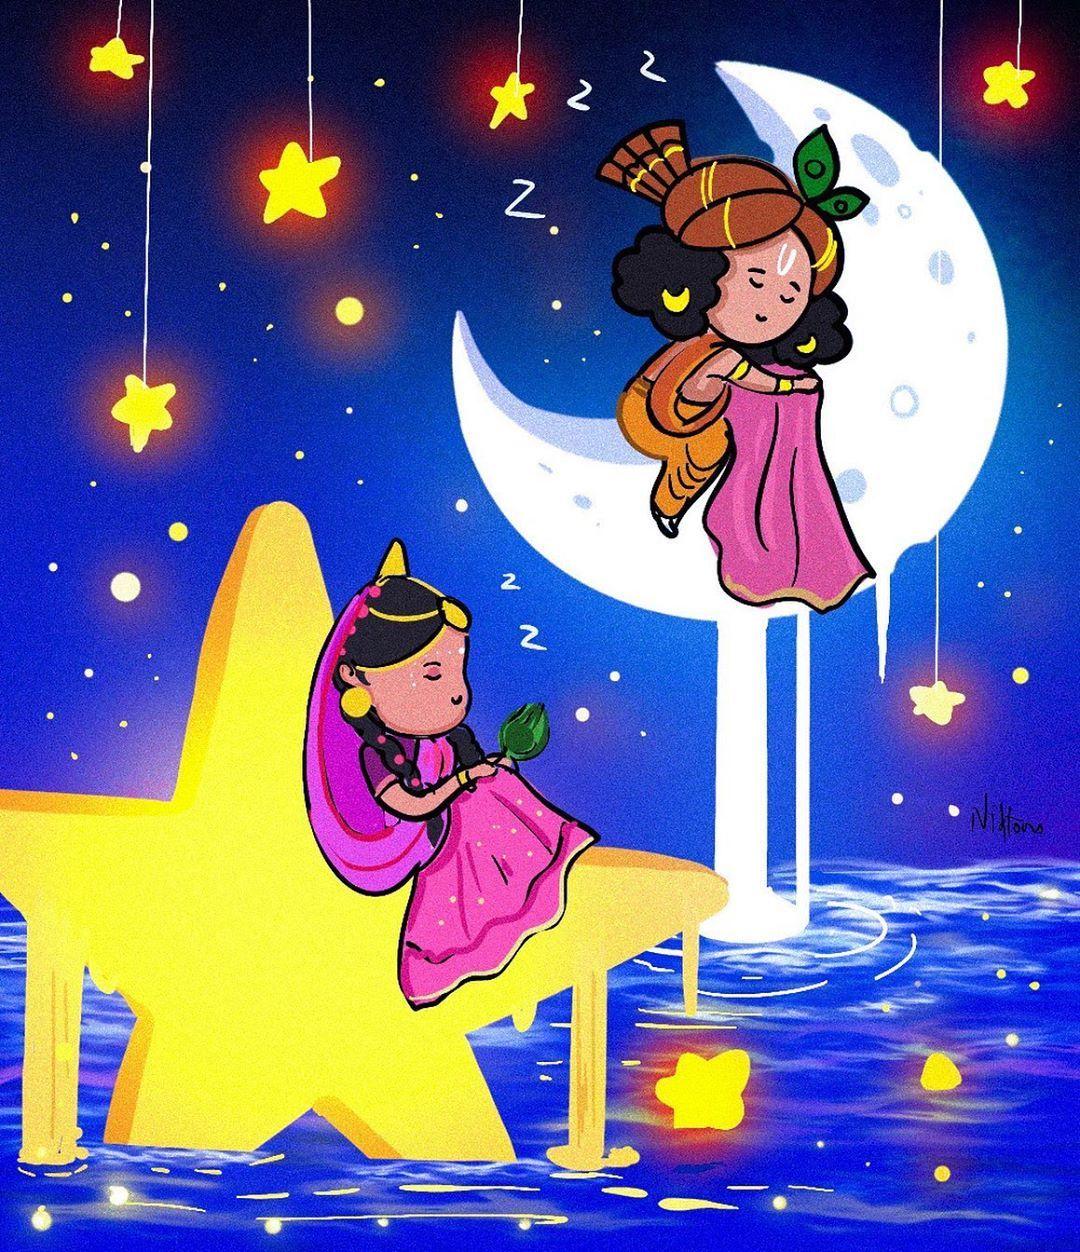 nidhi draws on instagram good night everyone drawthisinyourstyle radhakrishna krishna painting cute krishna krishna radha painting krishna painting cute krishna